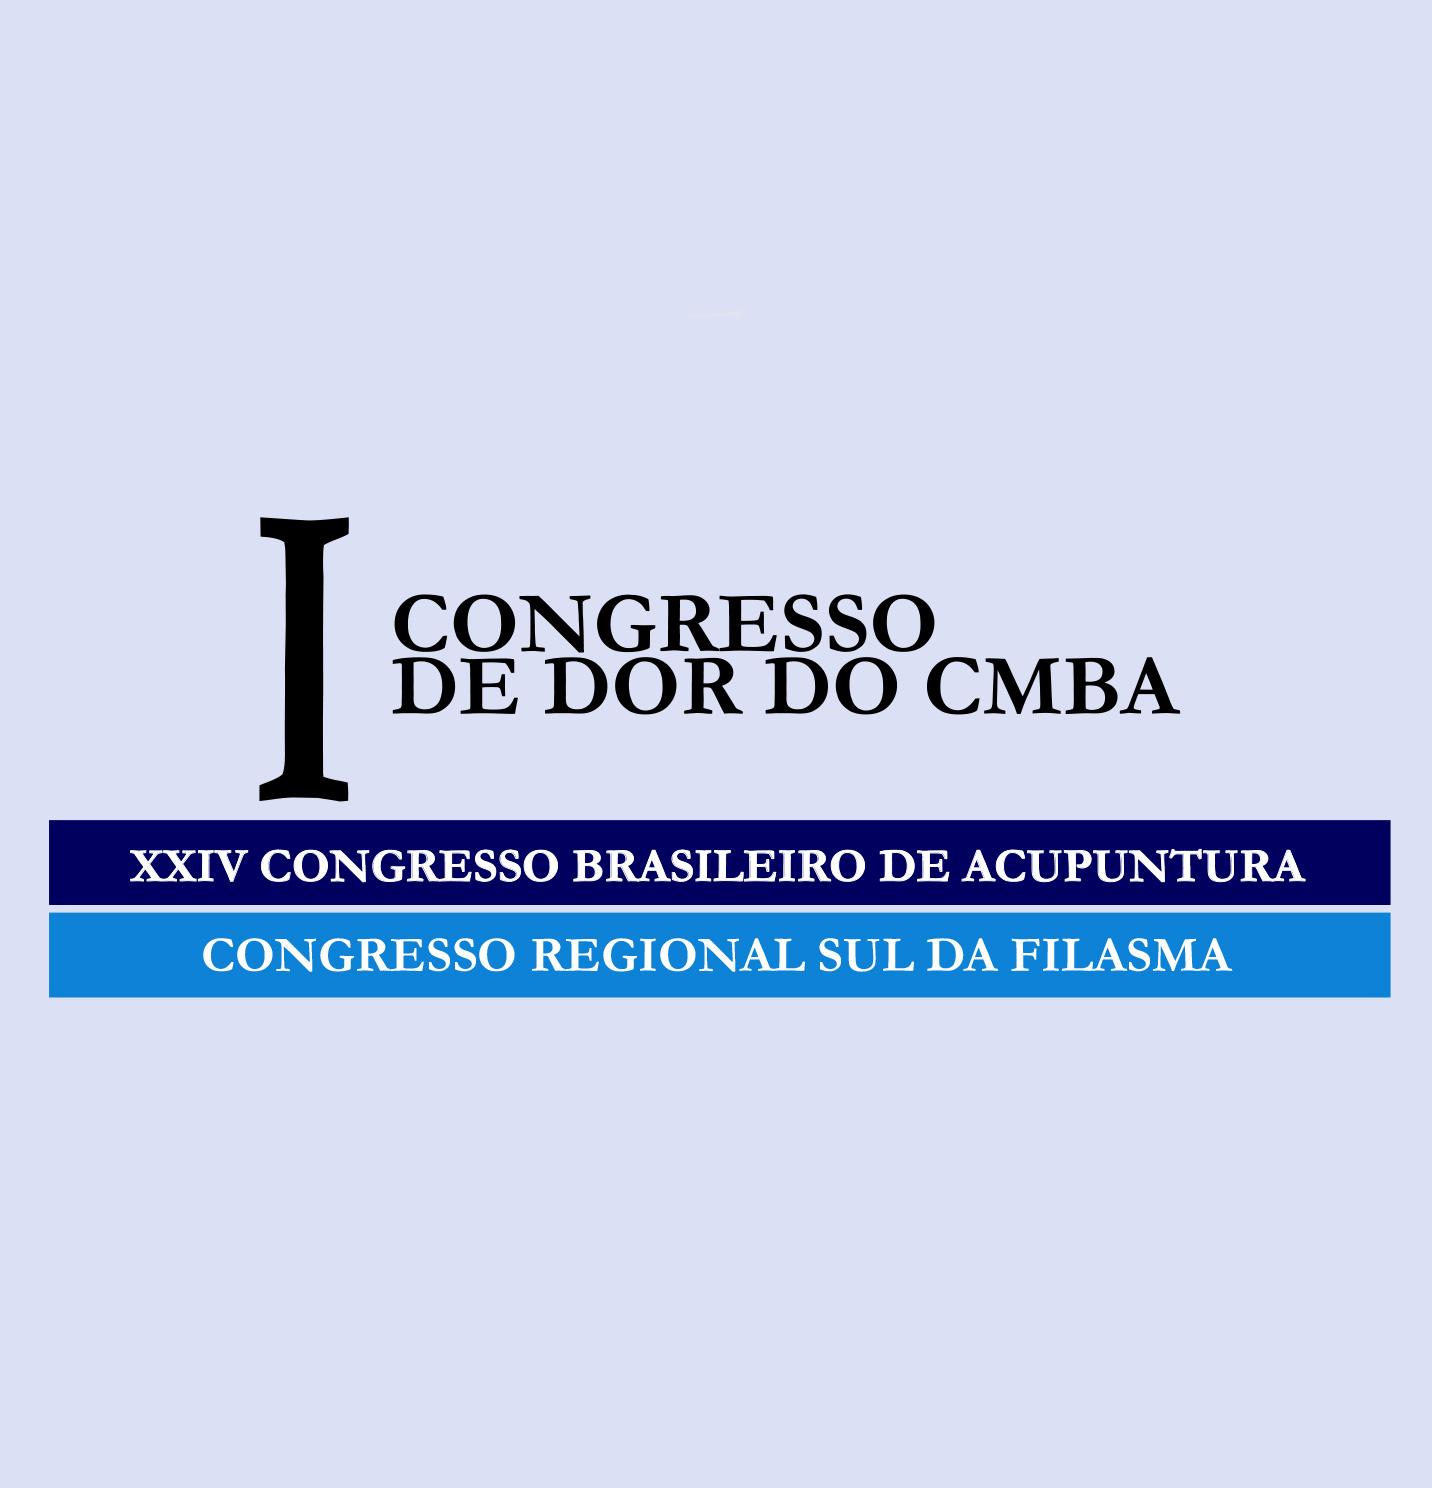 XXIV Congresso Brasileiro De Acupuntura.